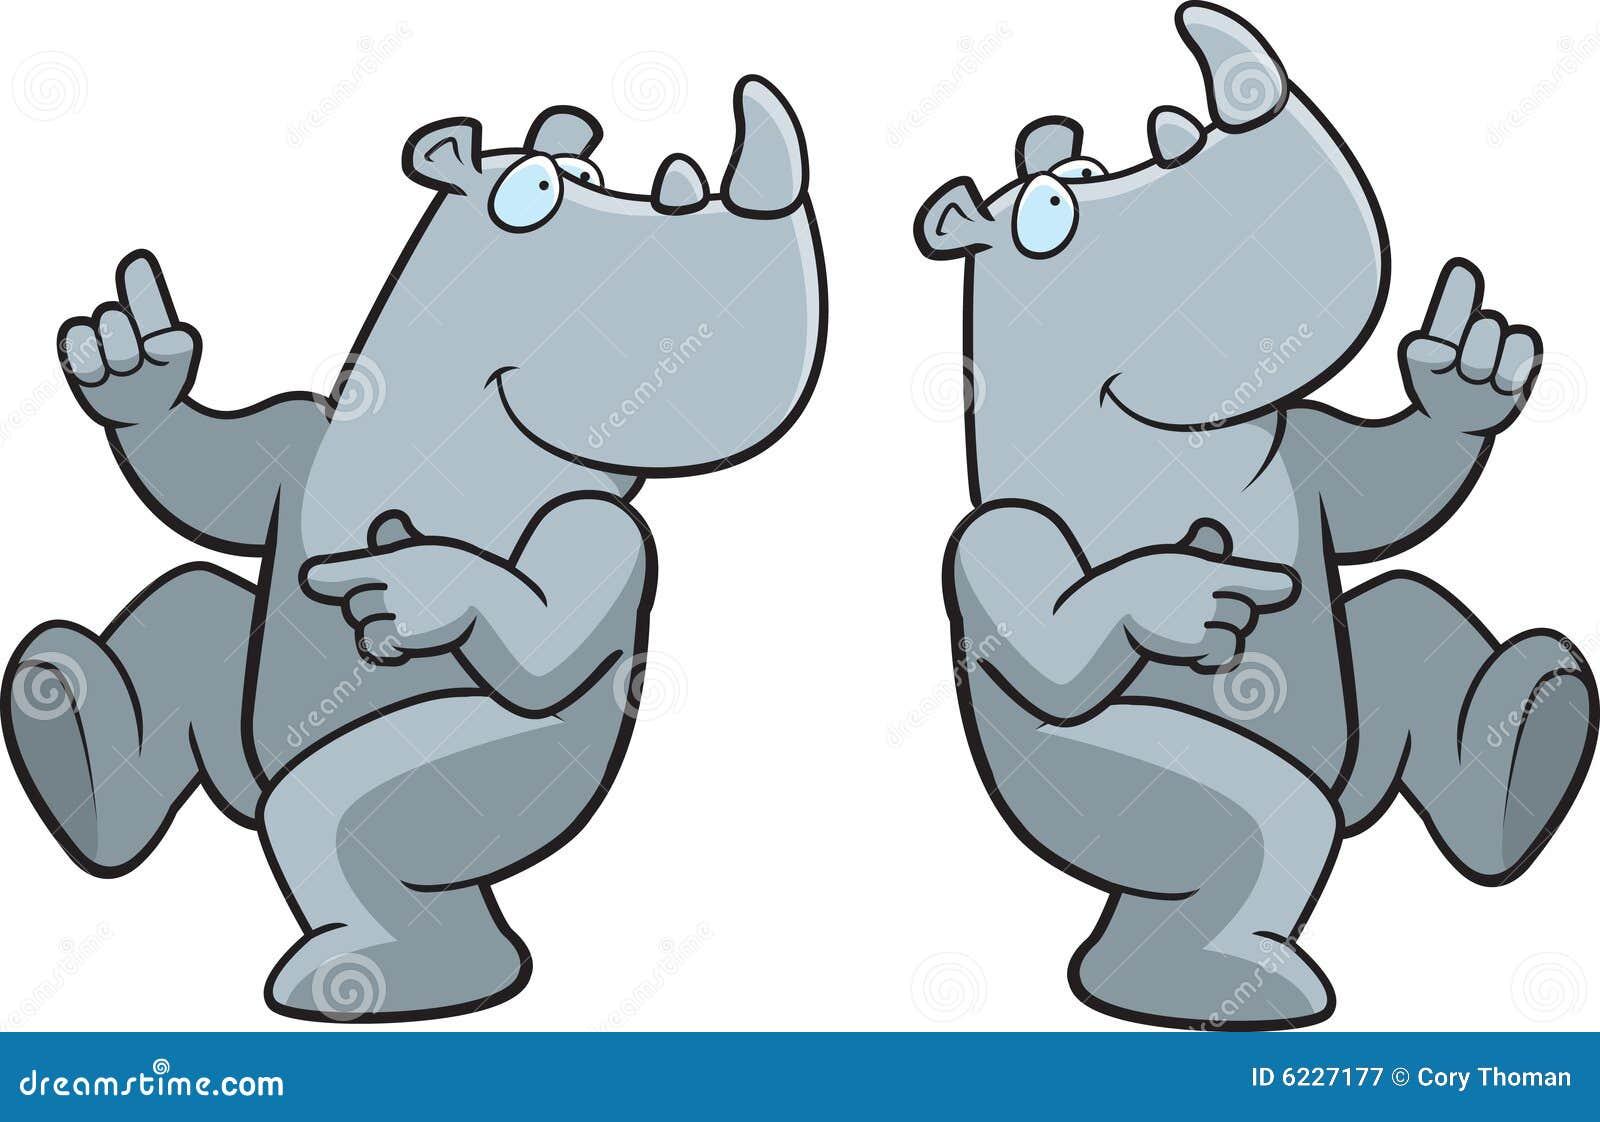 Dancing Rhino Royalty Free Stock Photography - Image: 6227177